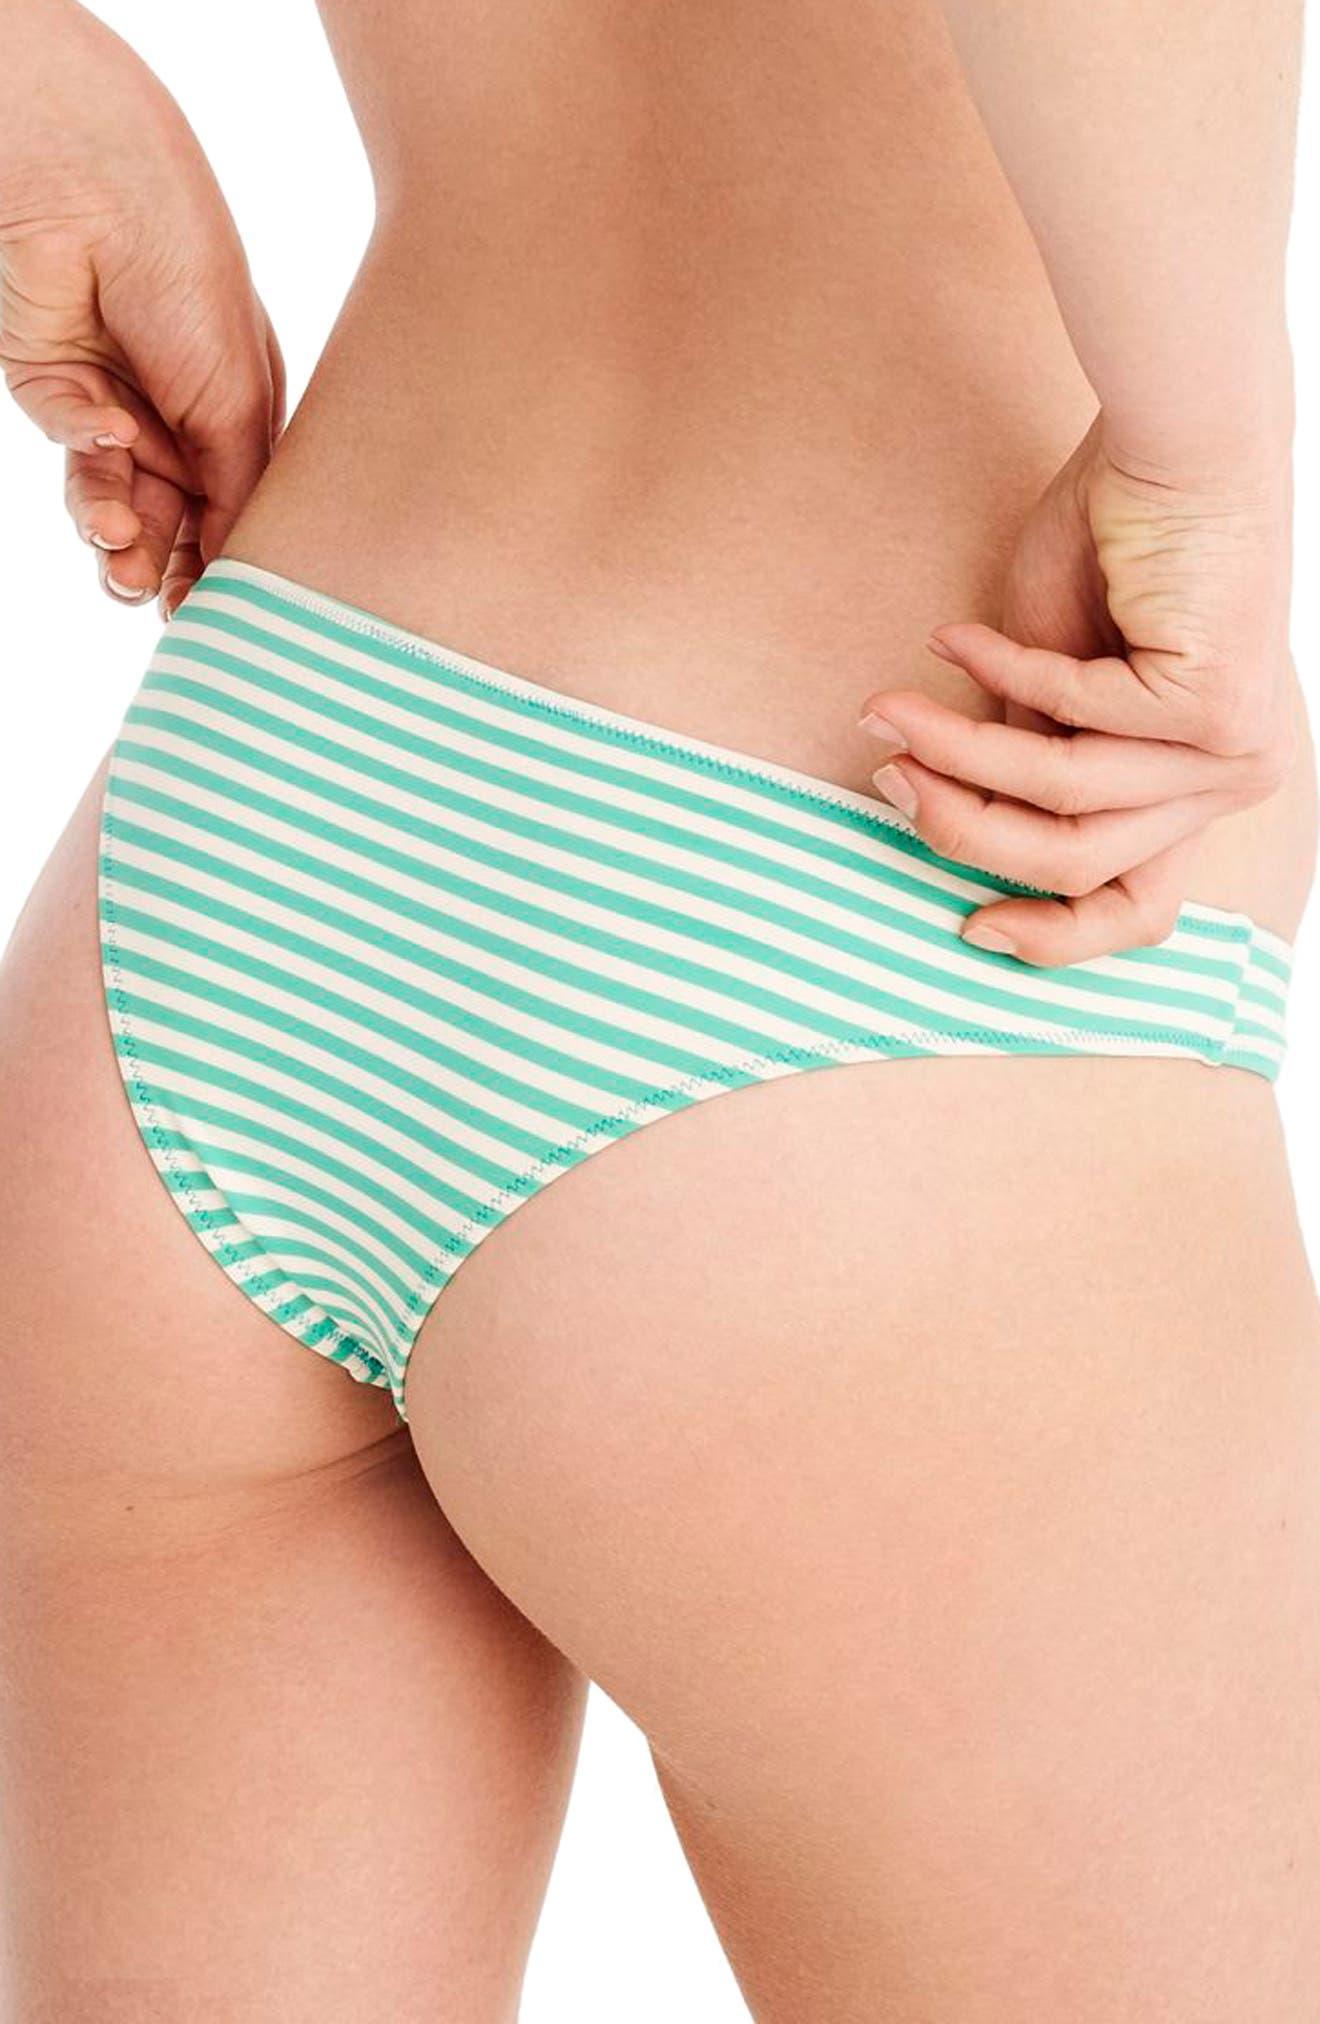 Daryl Hipster Cheeky Bikini Bottoms,                             Alternate thumbnail 2, color,                             Bright Patina/ Ivory